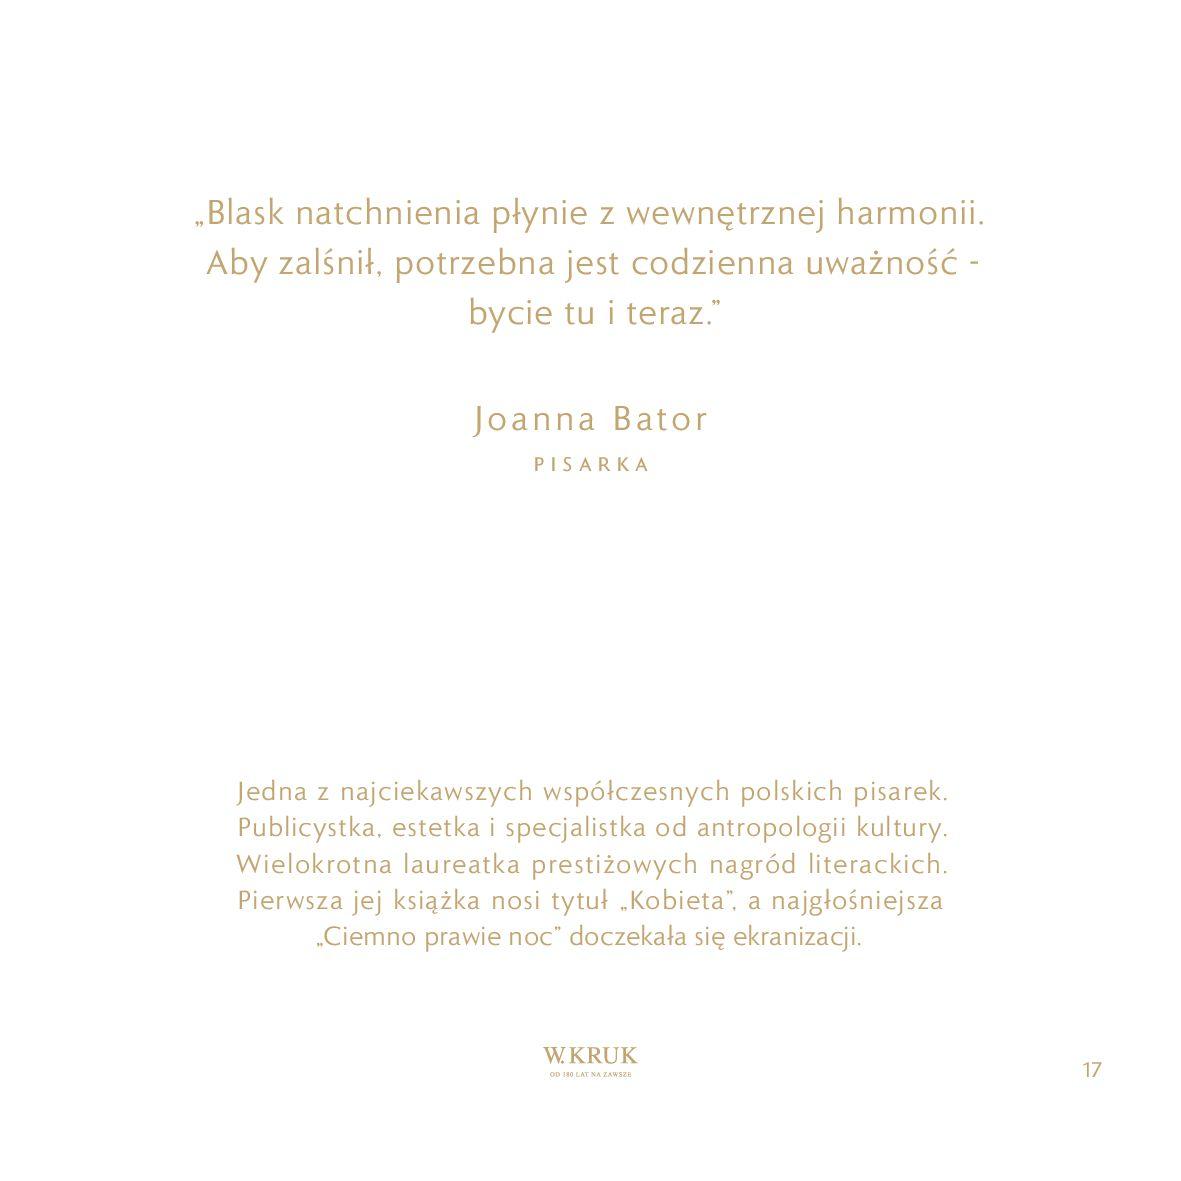 Gazetka W. KRUK: Katalog - Kolekcja Blask 2021-02-17 page-18